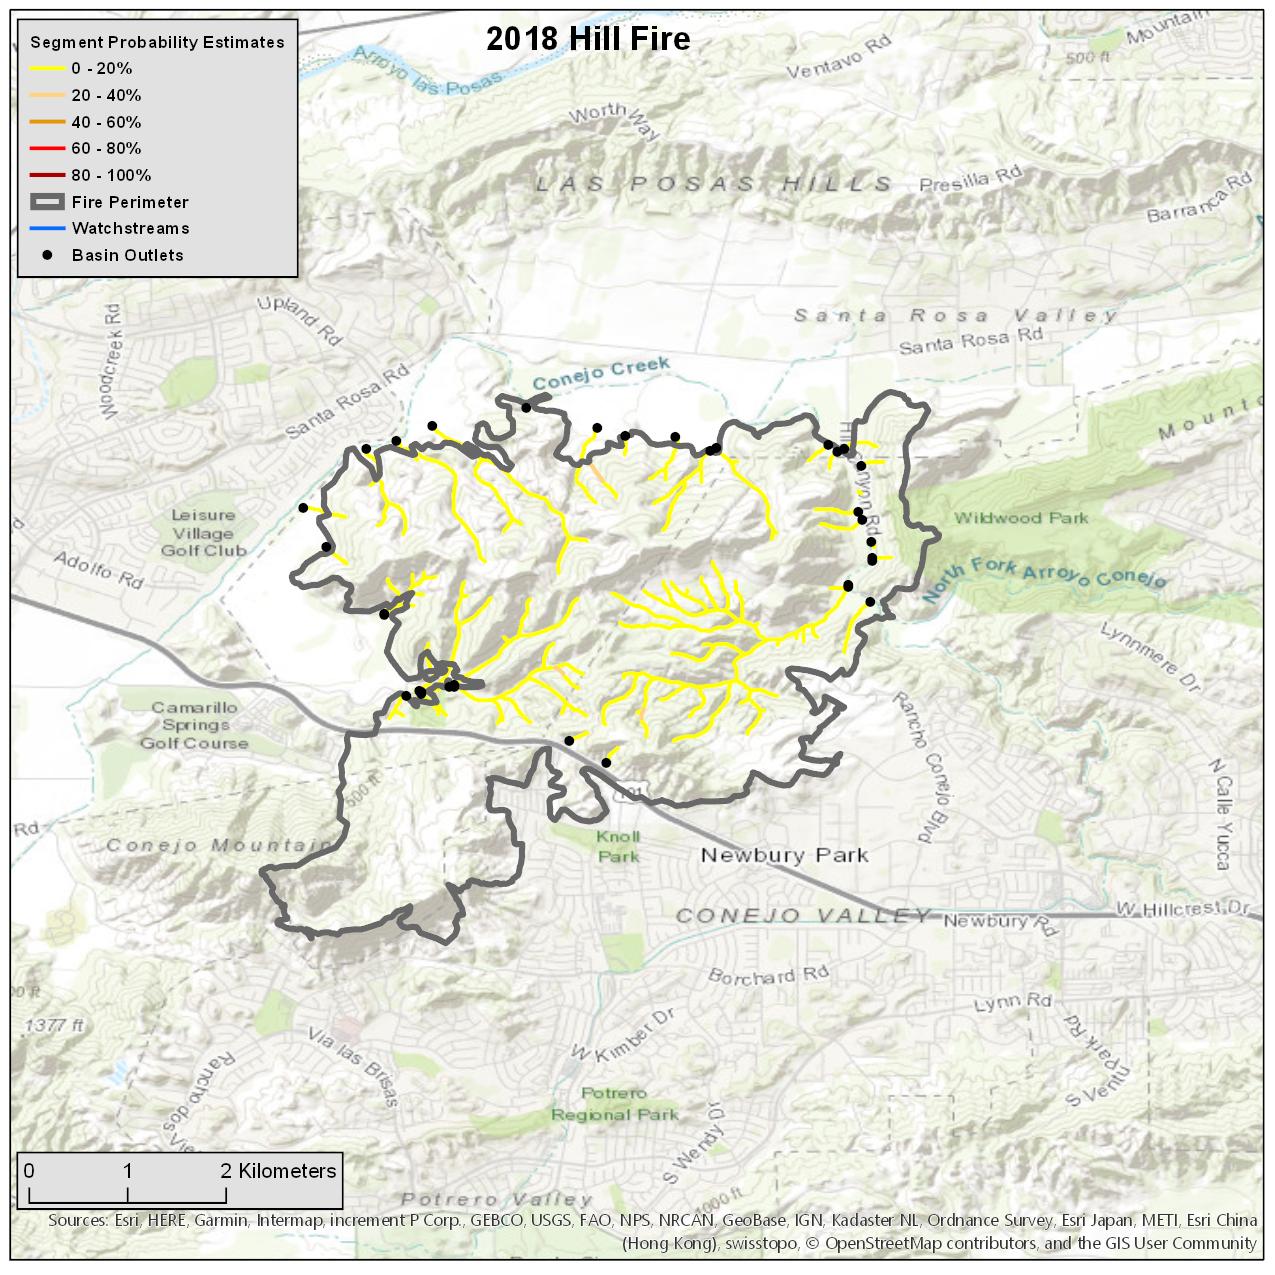 Valley Of Fire Map Pdf.Emergency Assessment Of Post Fire Debris Flow Hazards